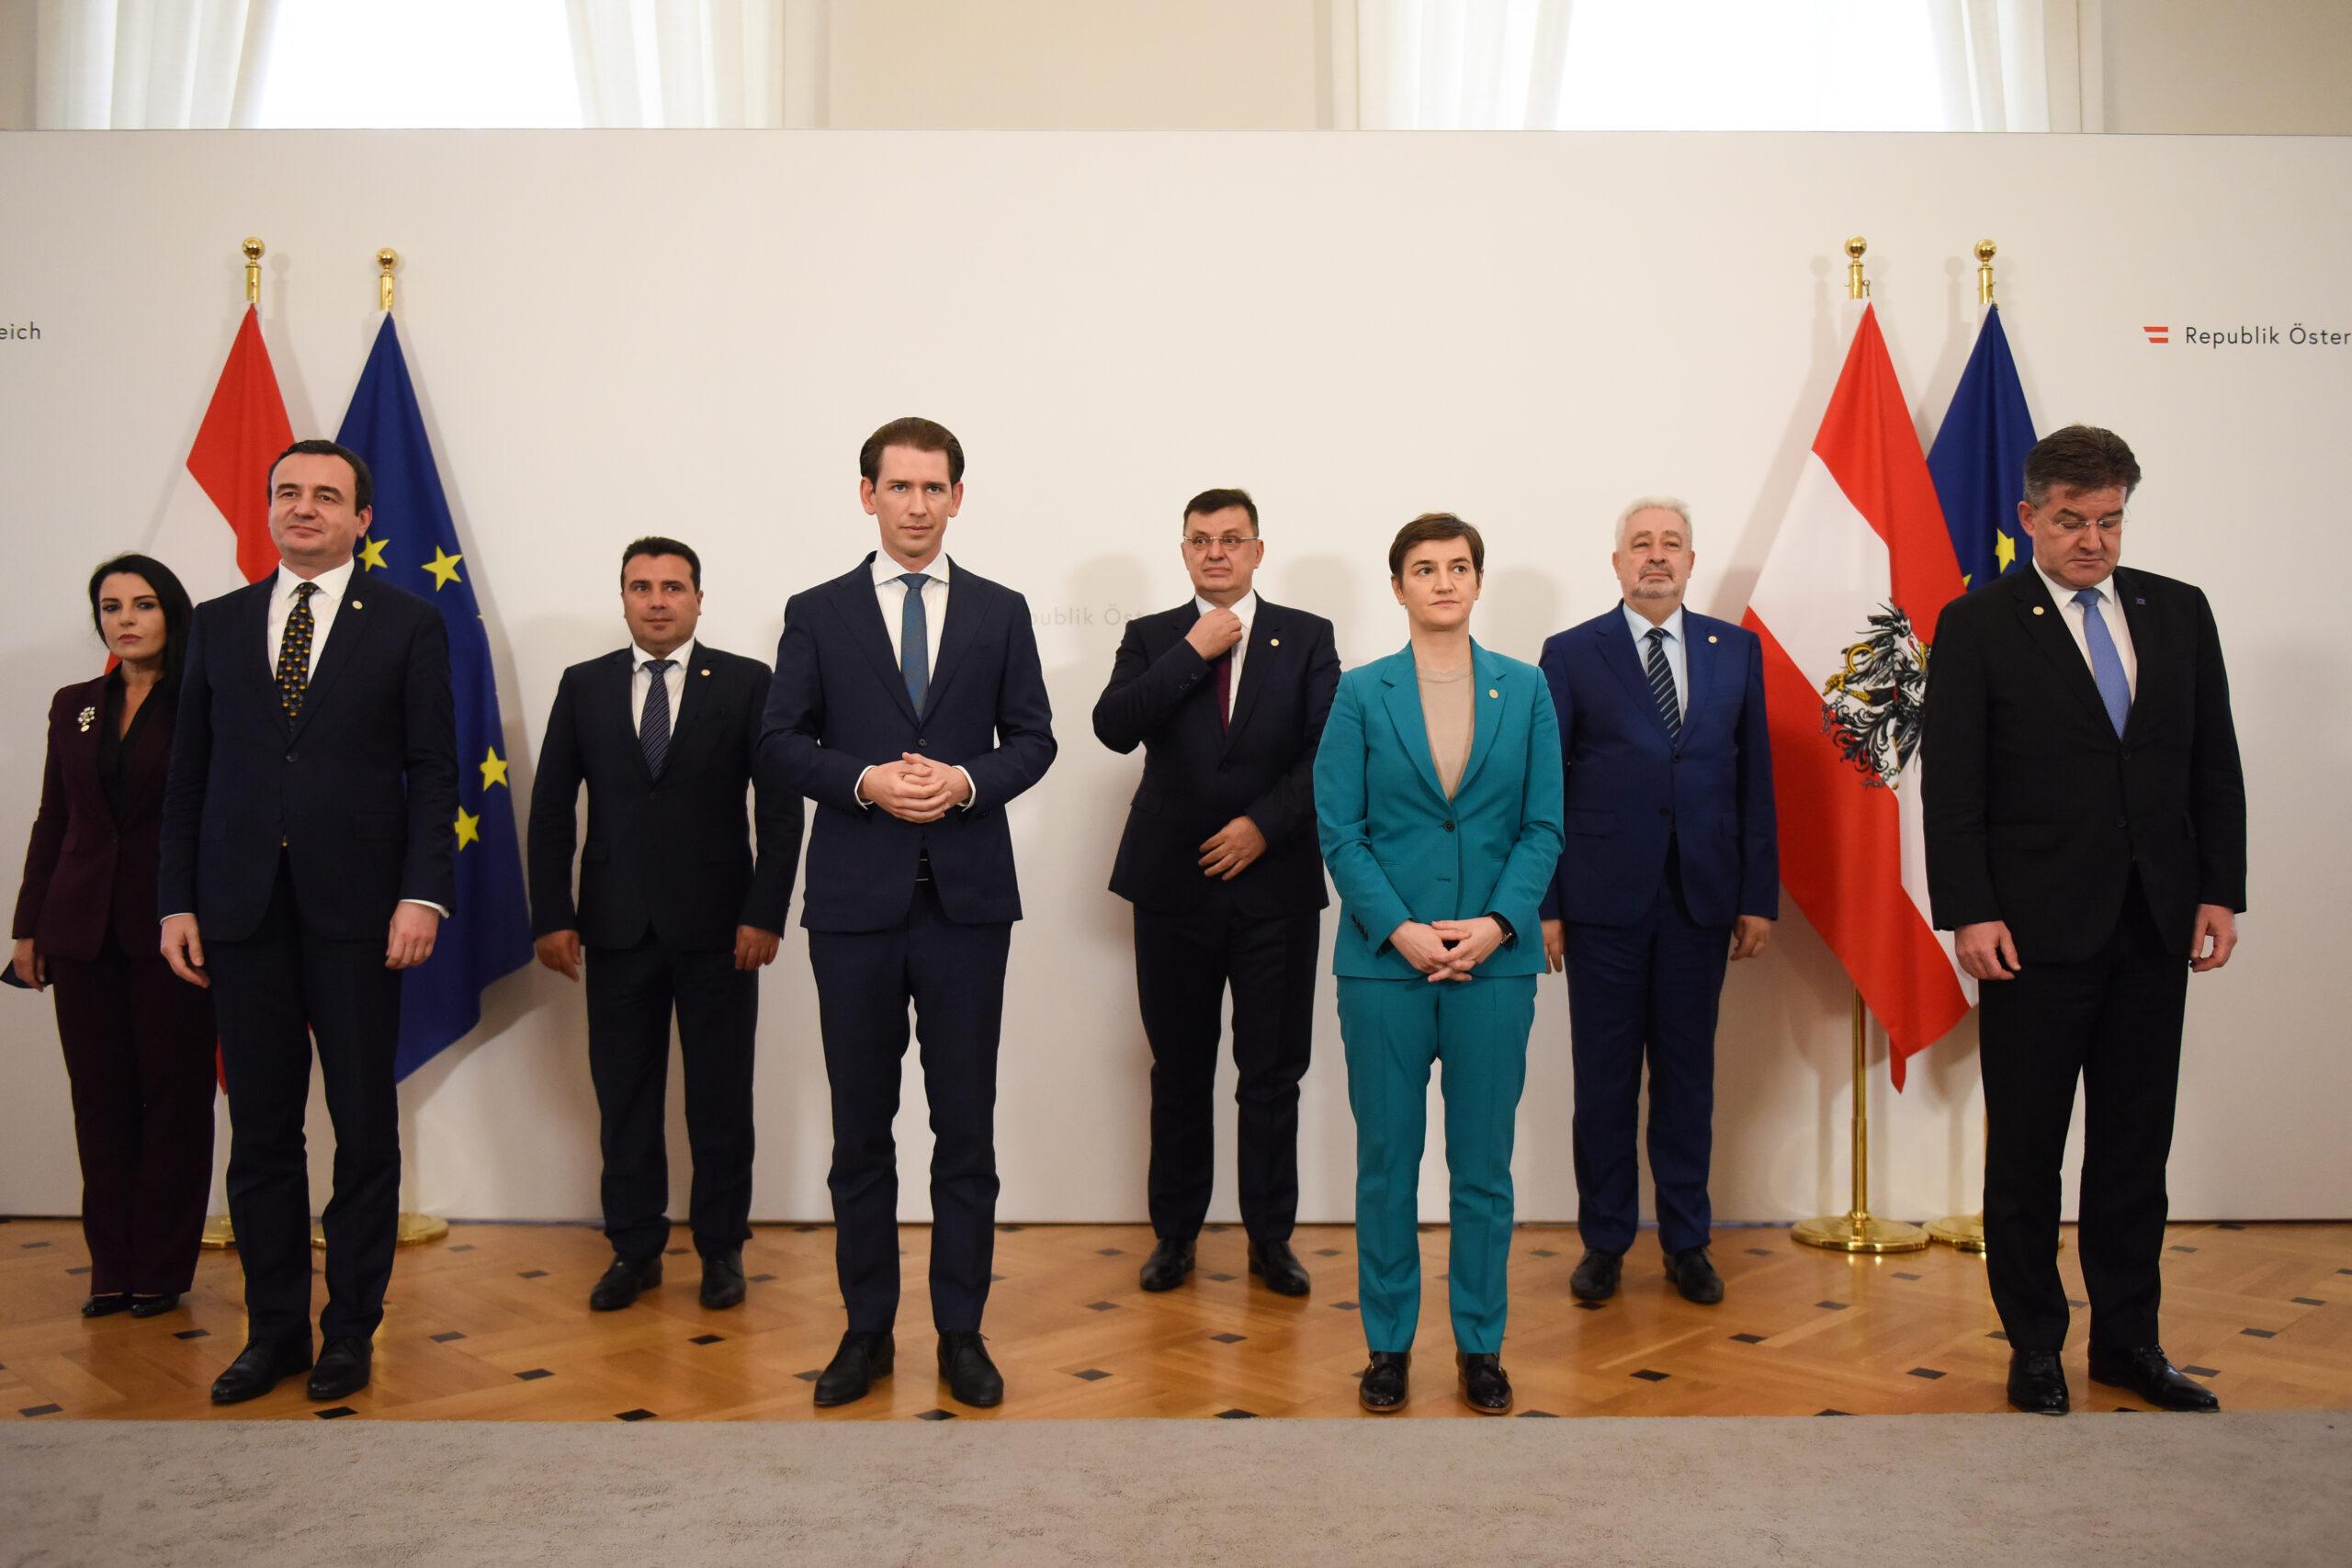 Kurz hosts Western Balkan leaders, discusses EU accession, delivery of vaccines - European Western Balkans